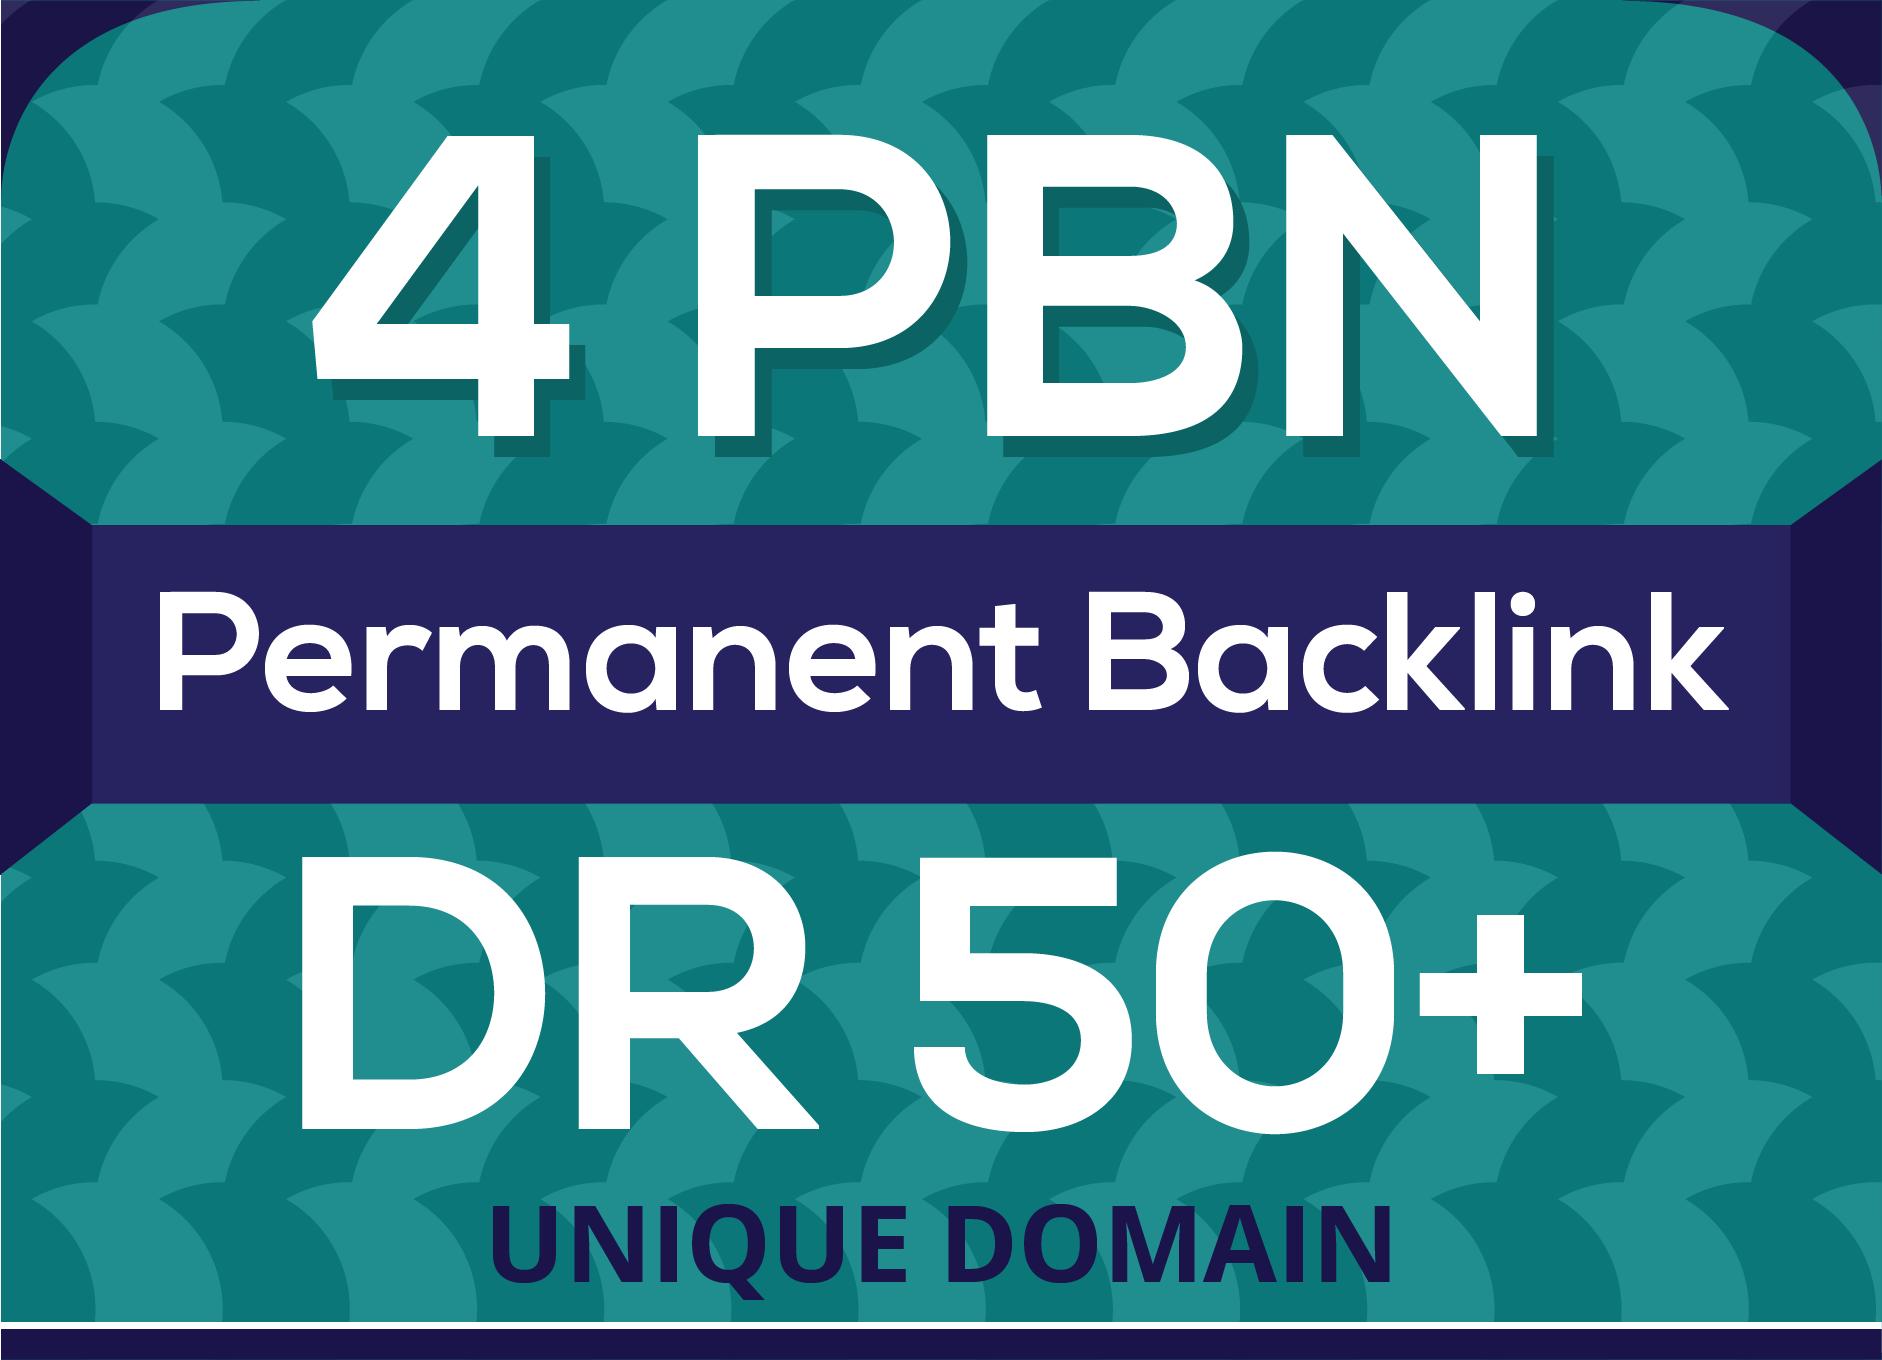 Creat 4 high quality DR 50+PBN backlinks